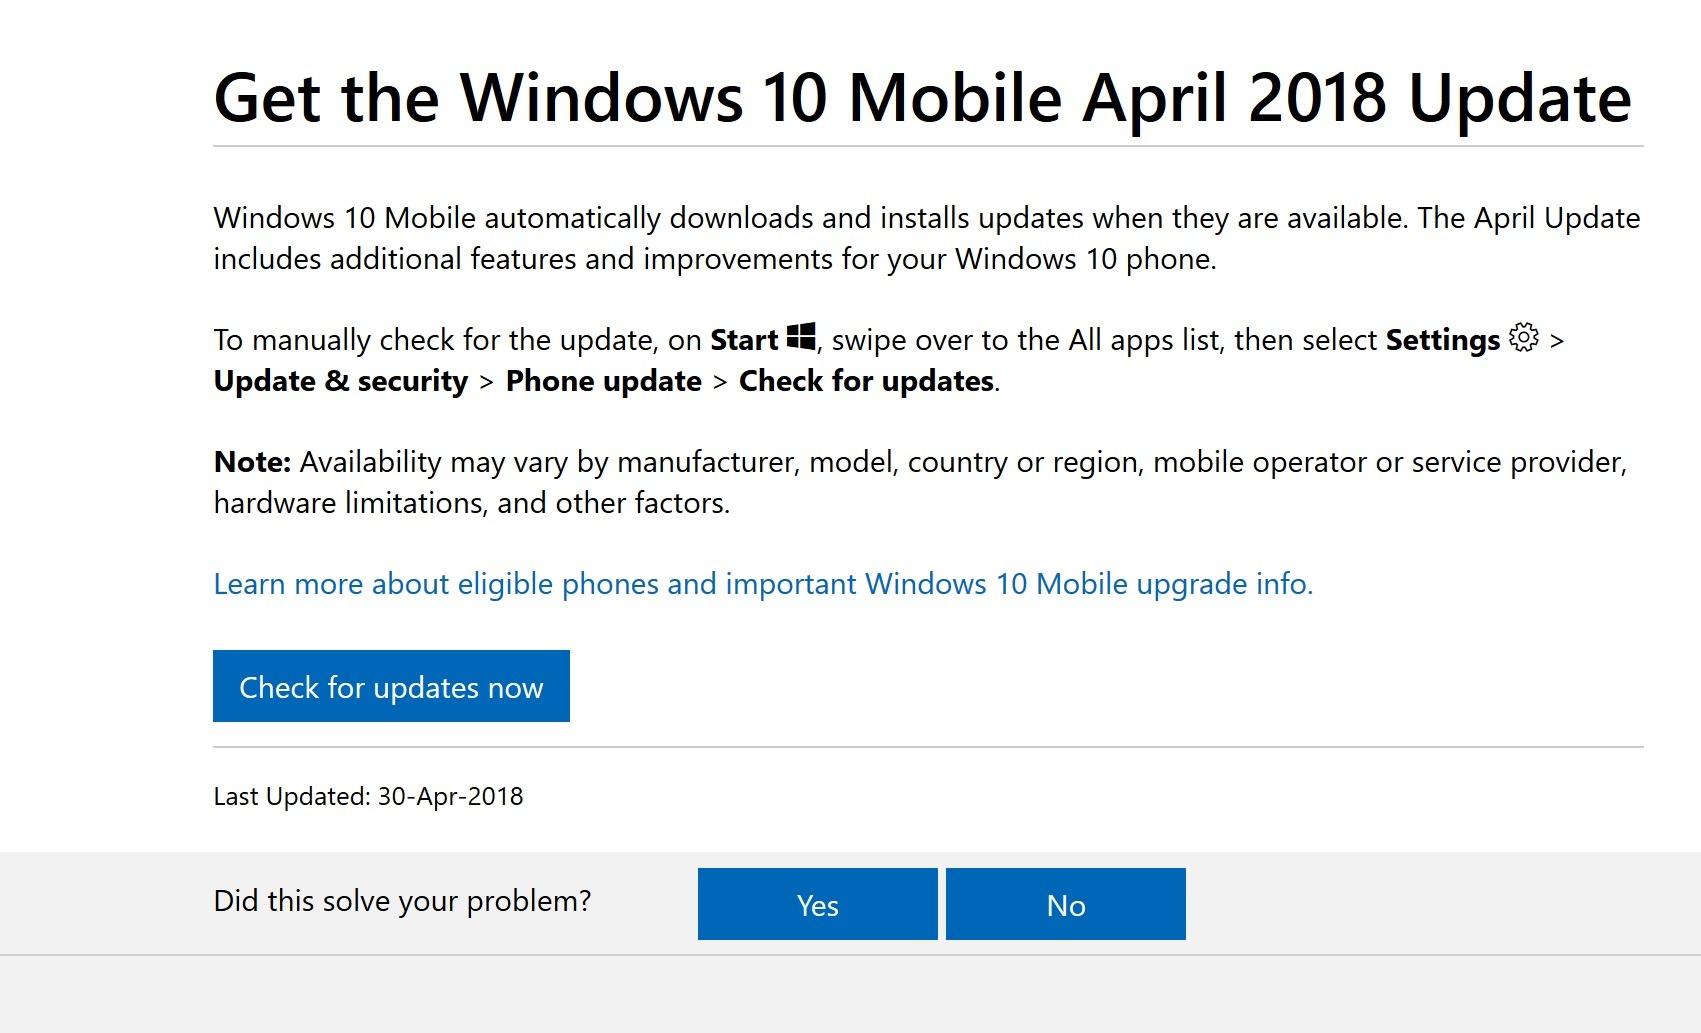 Windows 10 Mobile April 2018 Update